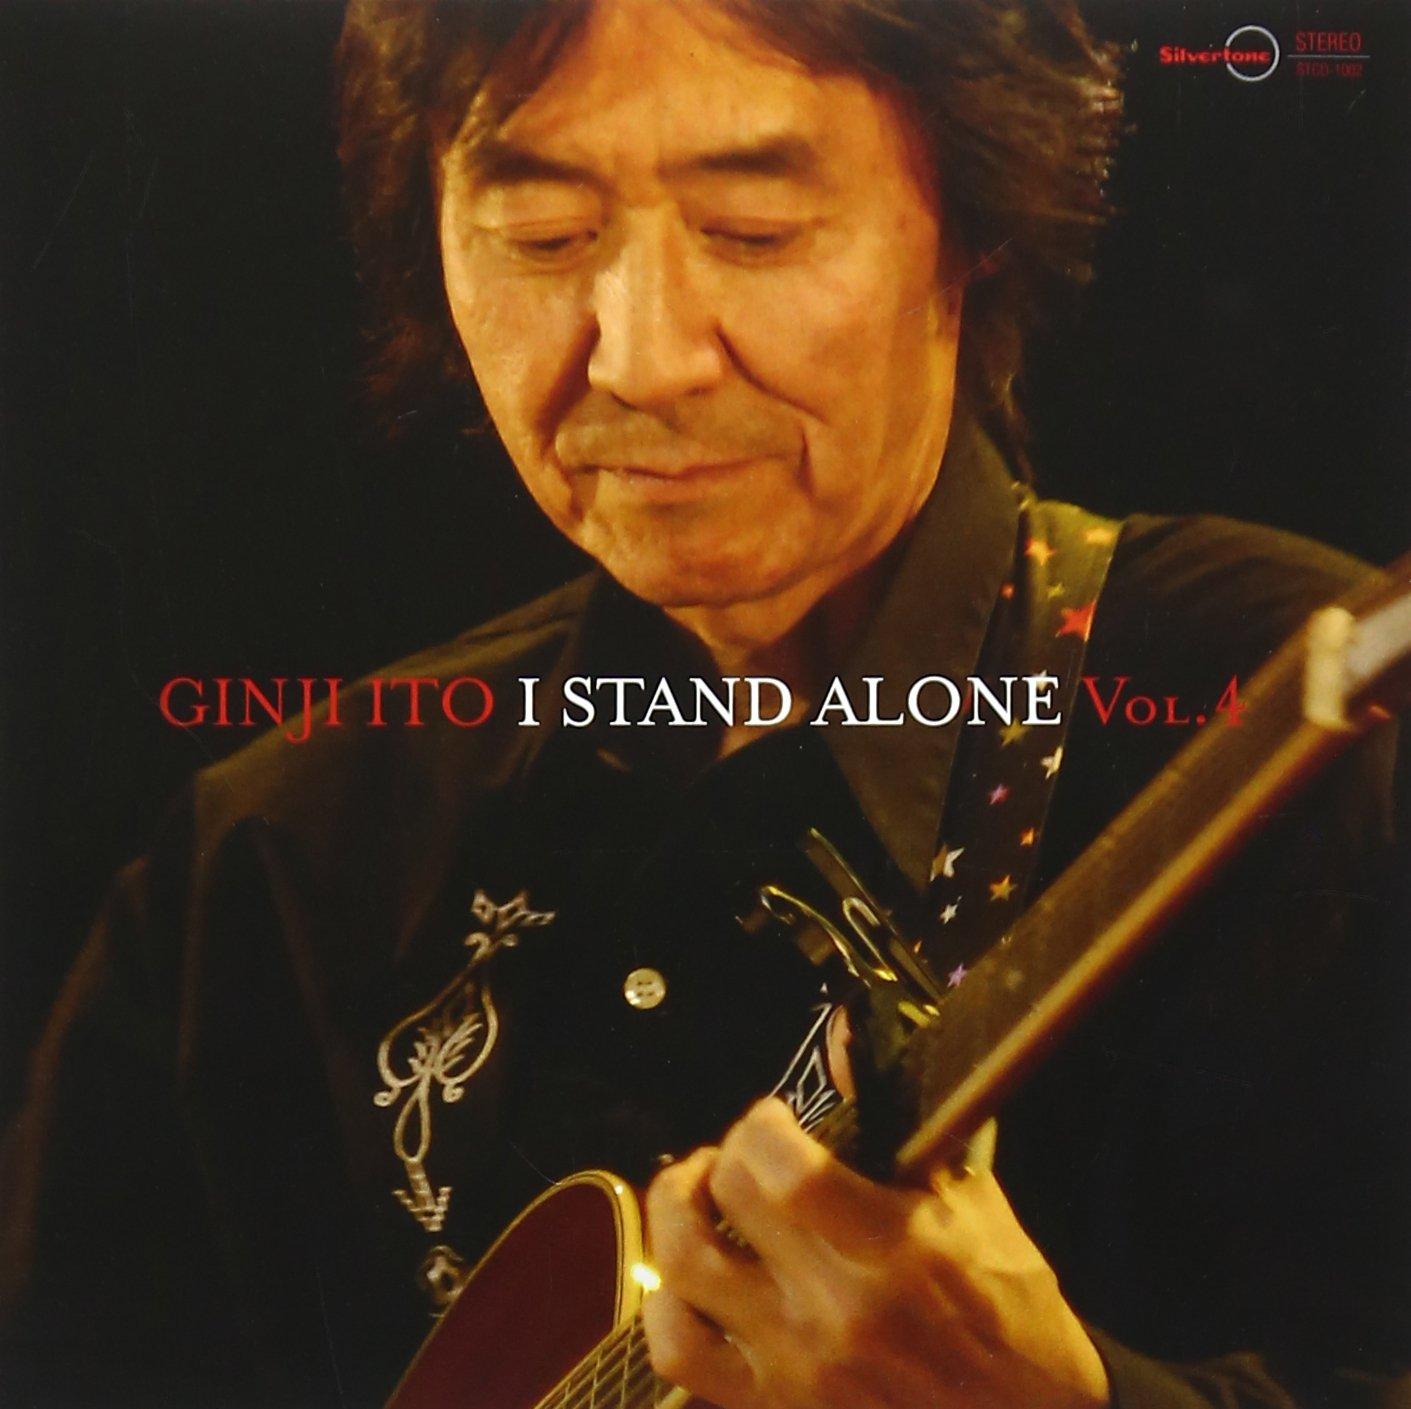 I STAND ALONE Vol.4